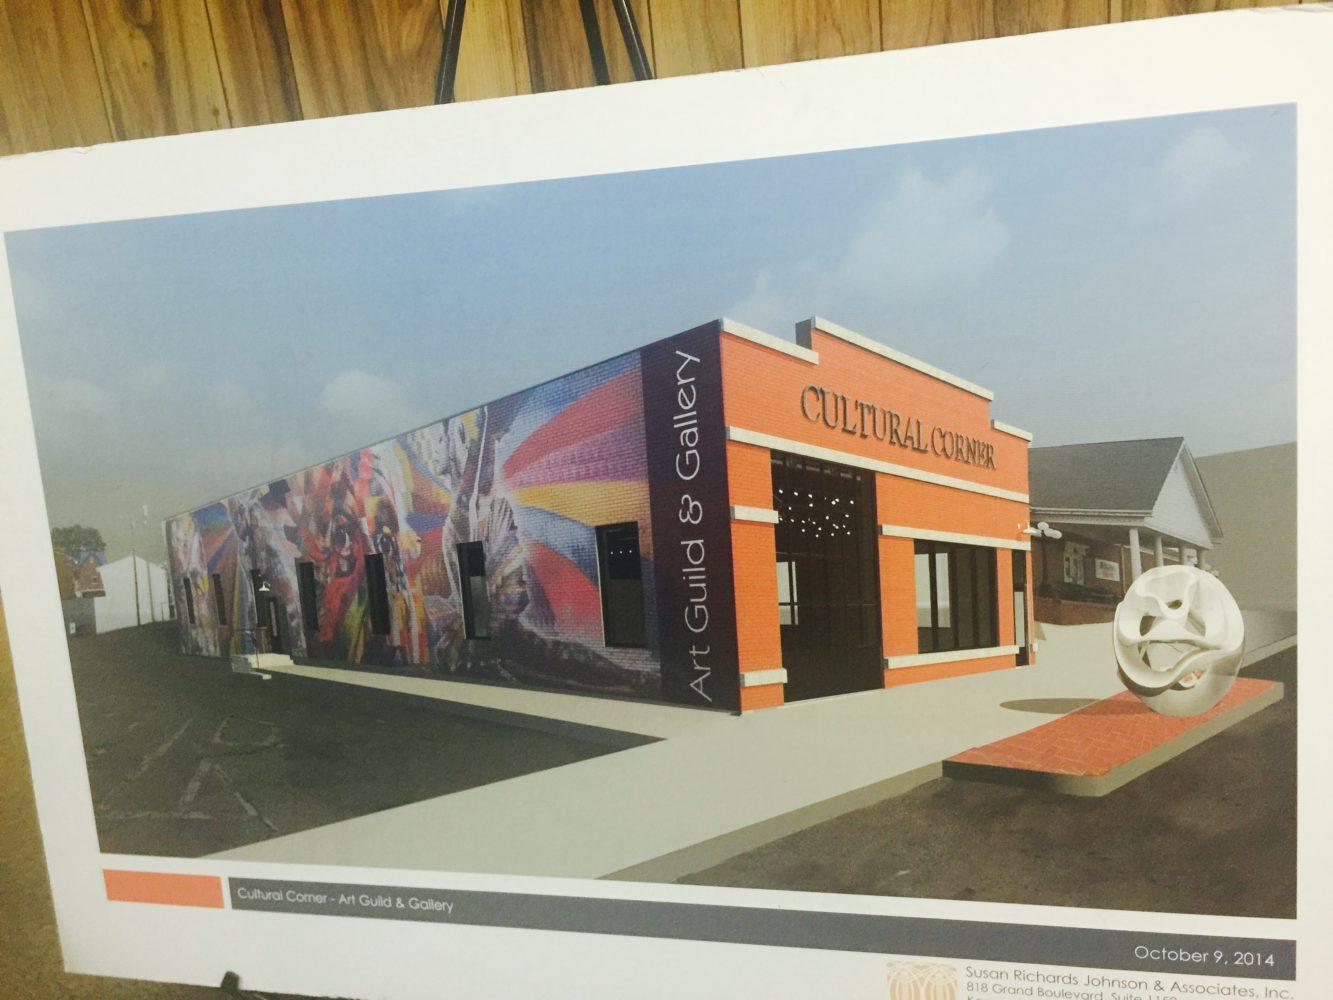 Chillicothe announces Neighborhood Assistance Program utilization